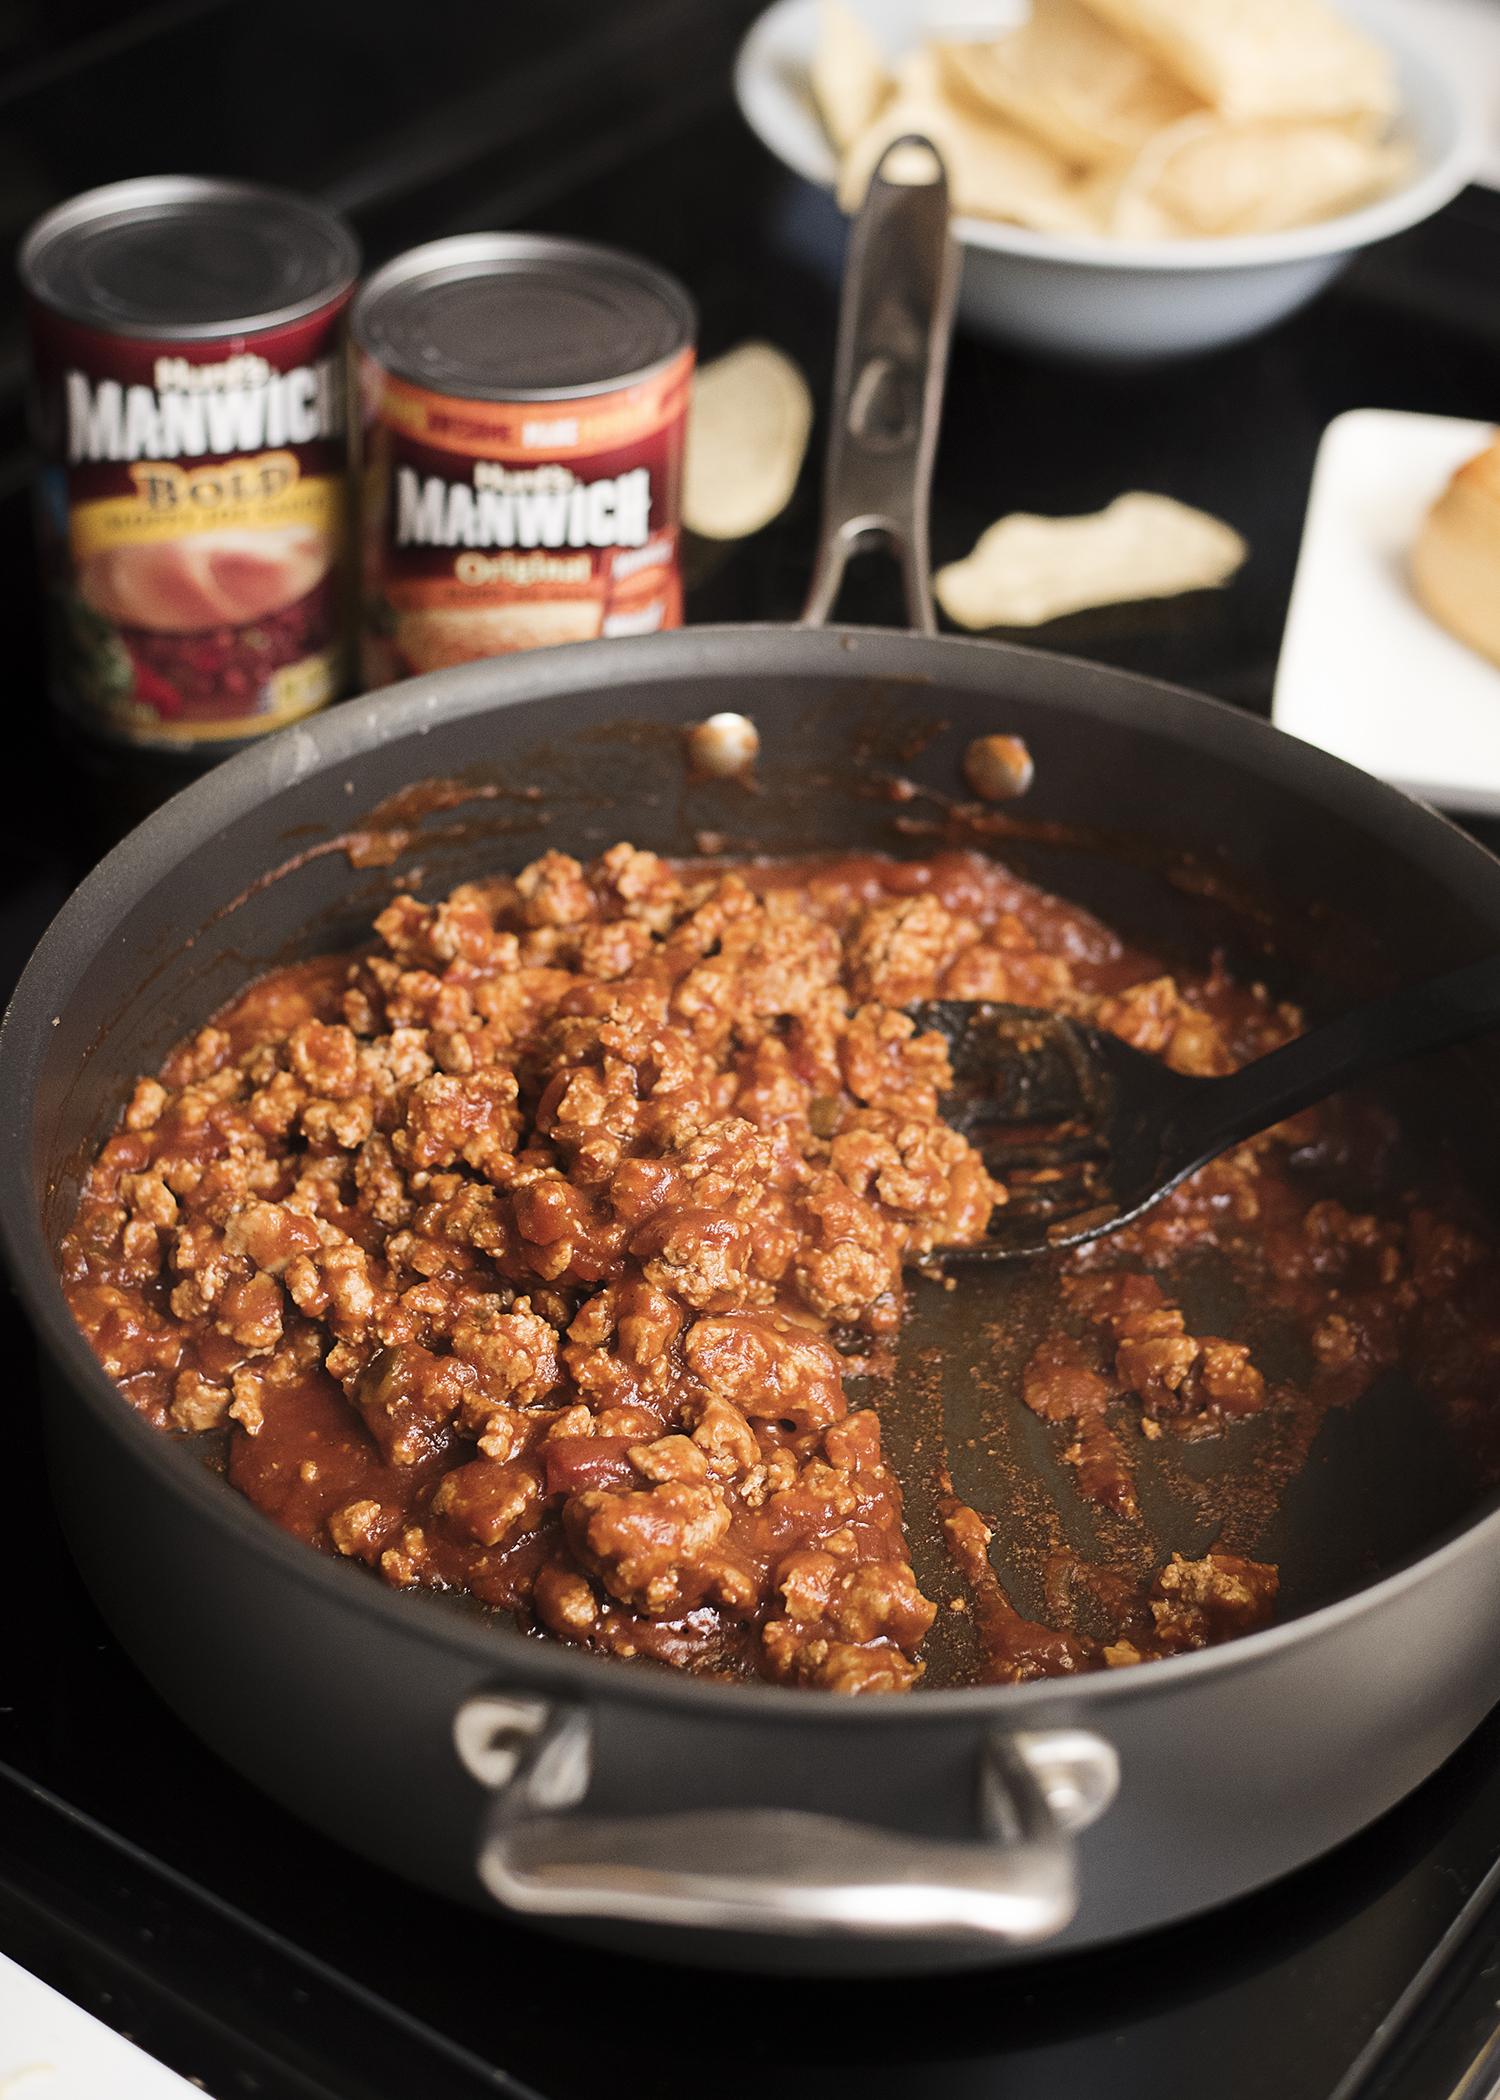 3 Easy Ways to Spice Up Manwich Sloppy Joes